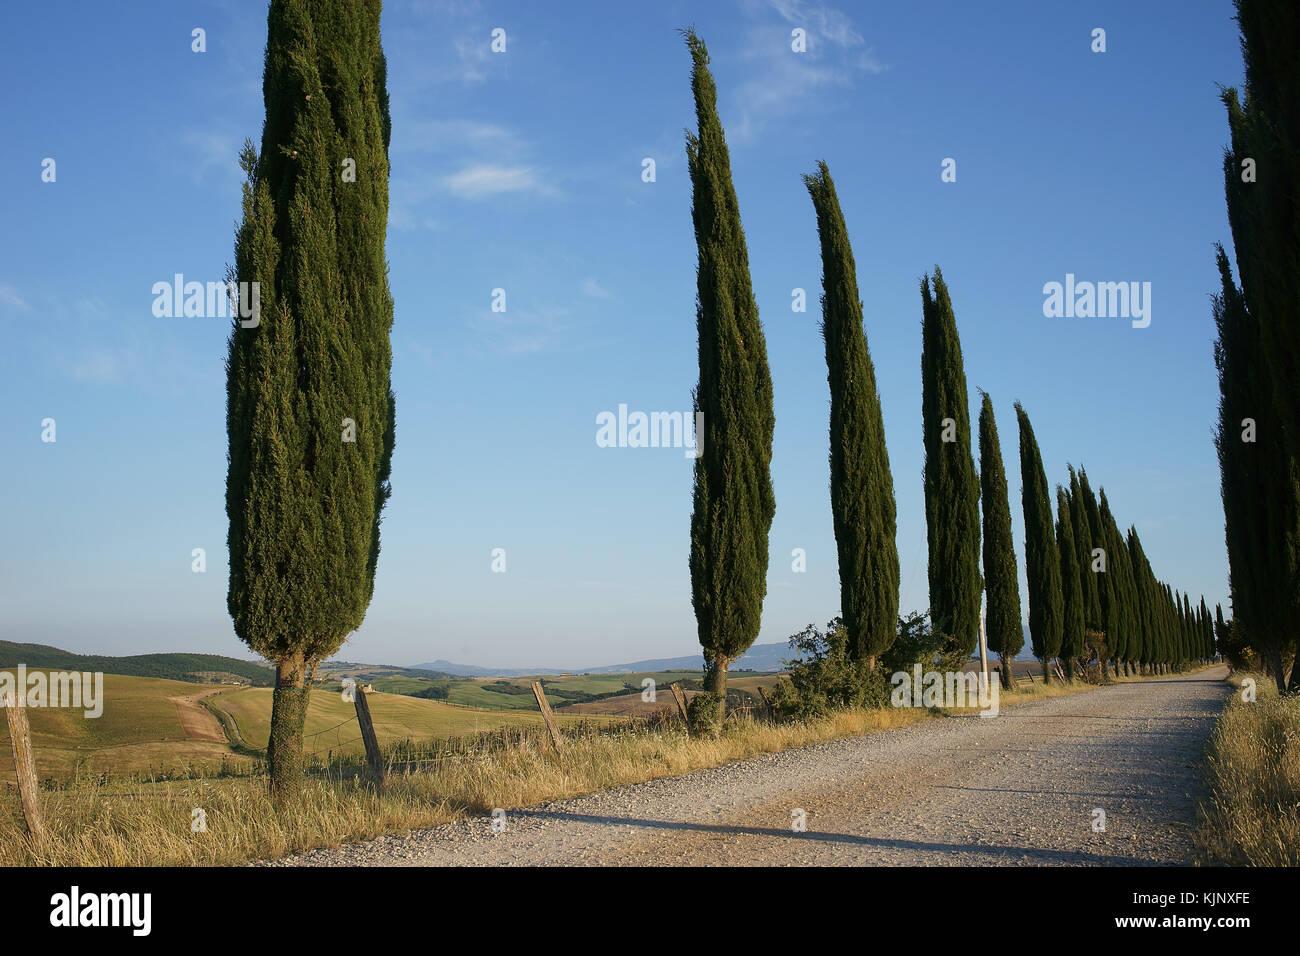 Street betwin Montisi and San Giovanni D'Asso, Crete senesi, Tuscany, italy - Stock Image